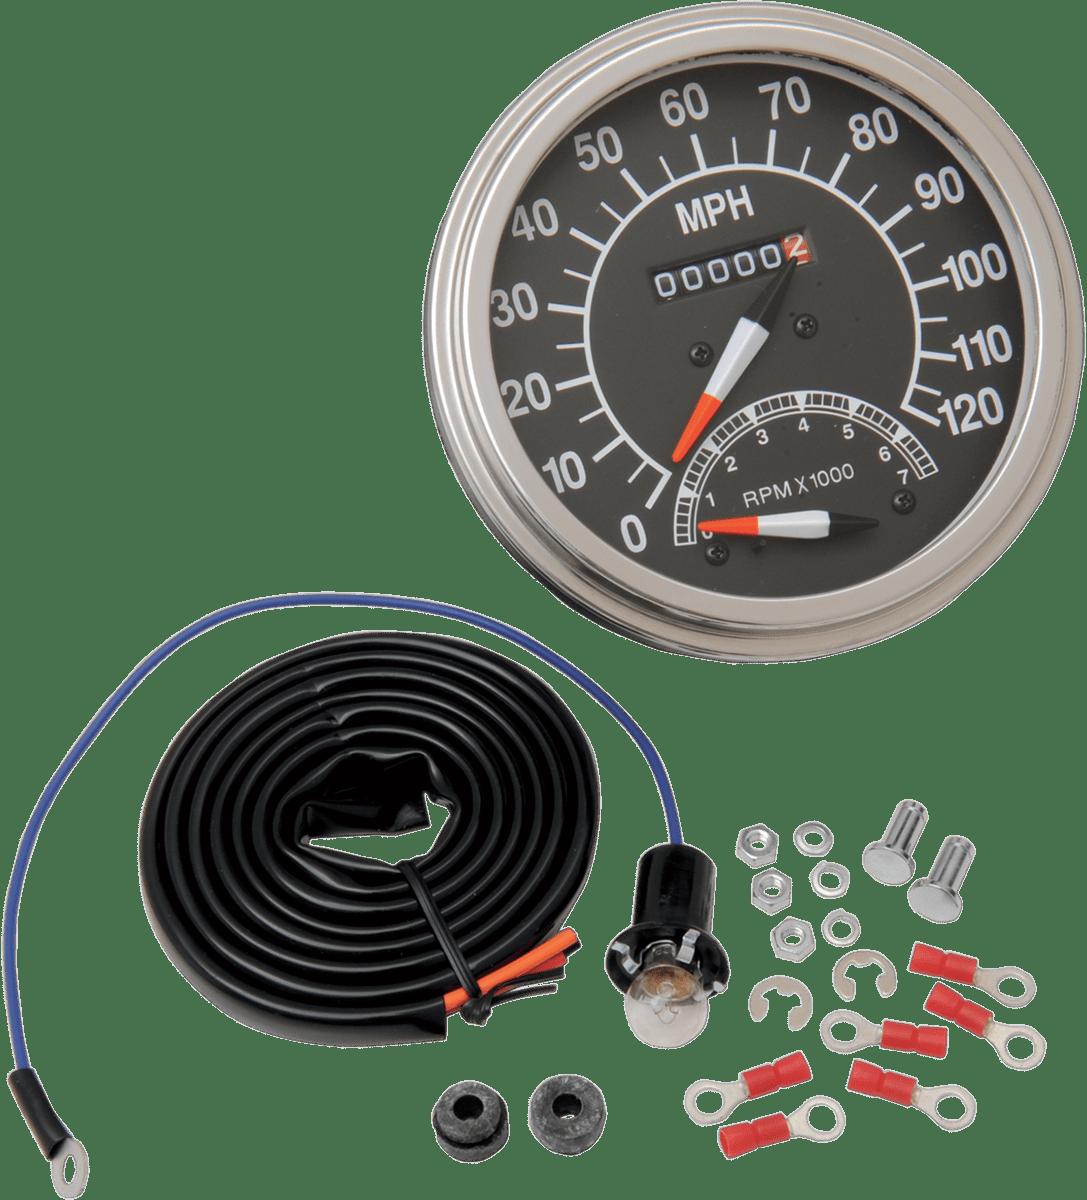 hight resolution of mopar tach wiring diagram wiring librarymopar tachometer wiring diagram explained wiring diagrams harley speed sensor wiring